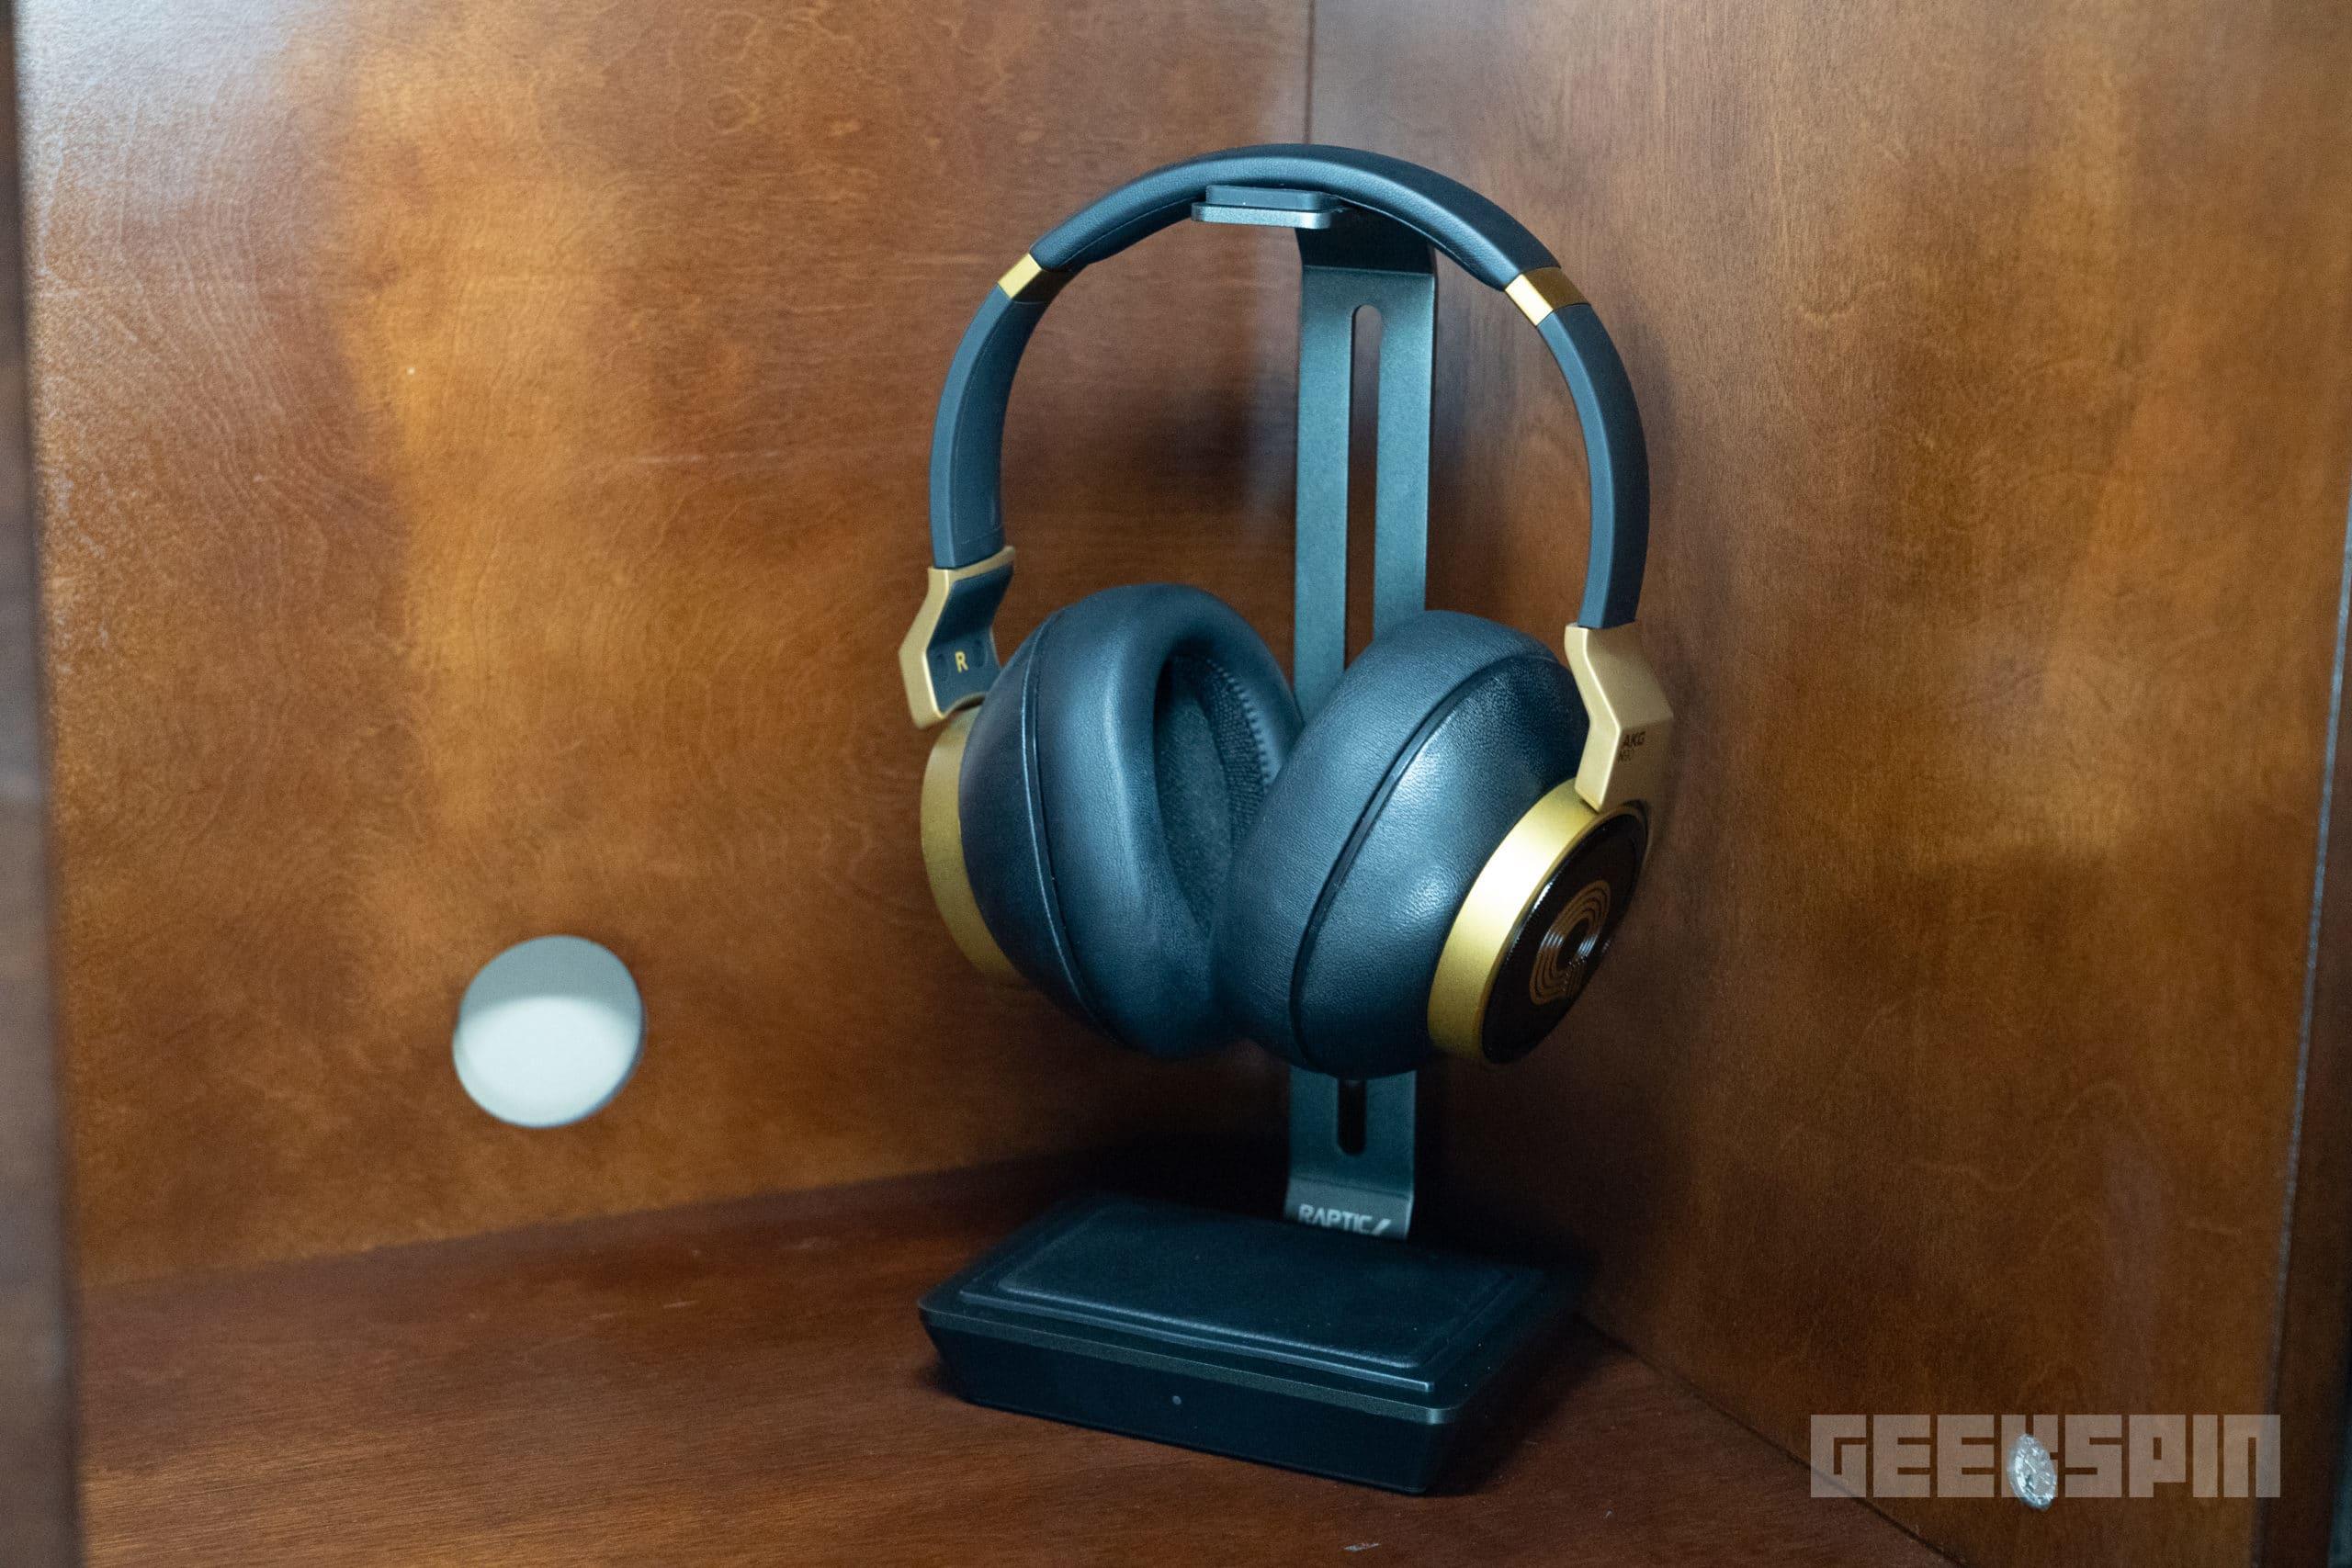 Raptic headphone stand